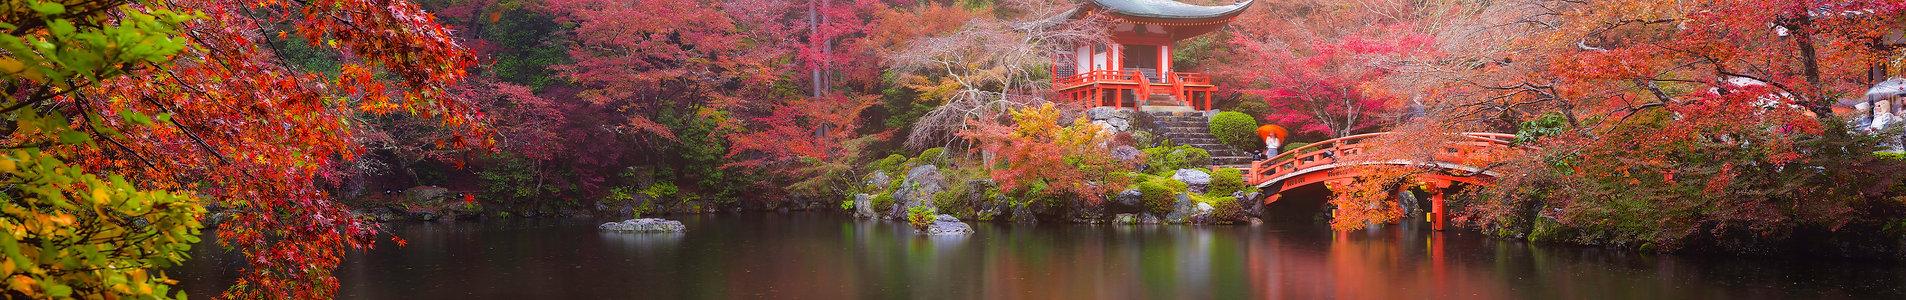 Japan - AdobeStock_97537644.jpeg